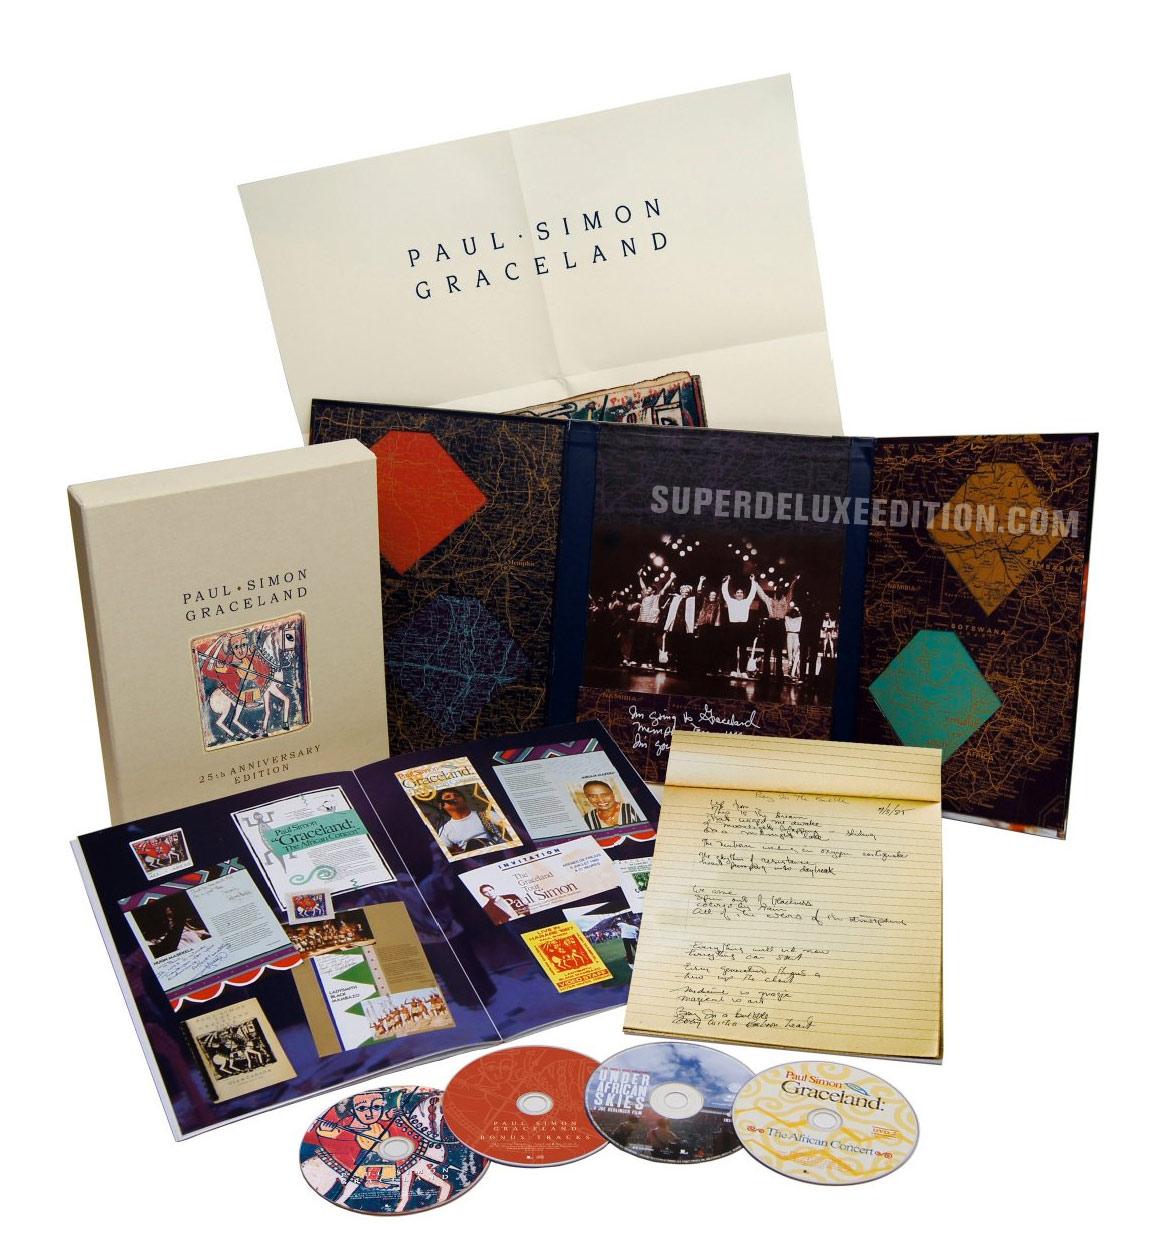 Paul Simon / Graceland 25th Anniversary Collectors Edition Box Set Photo